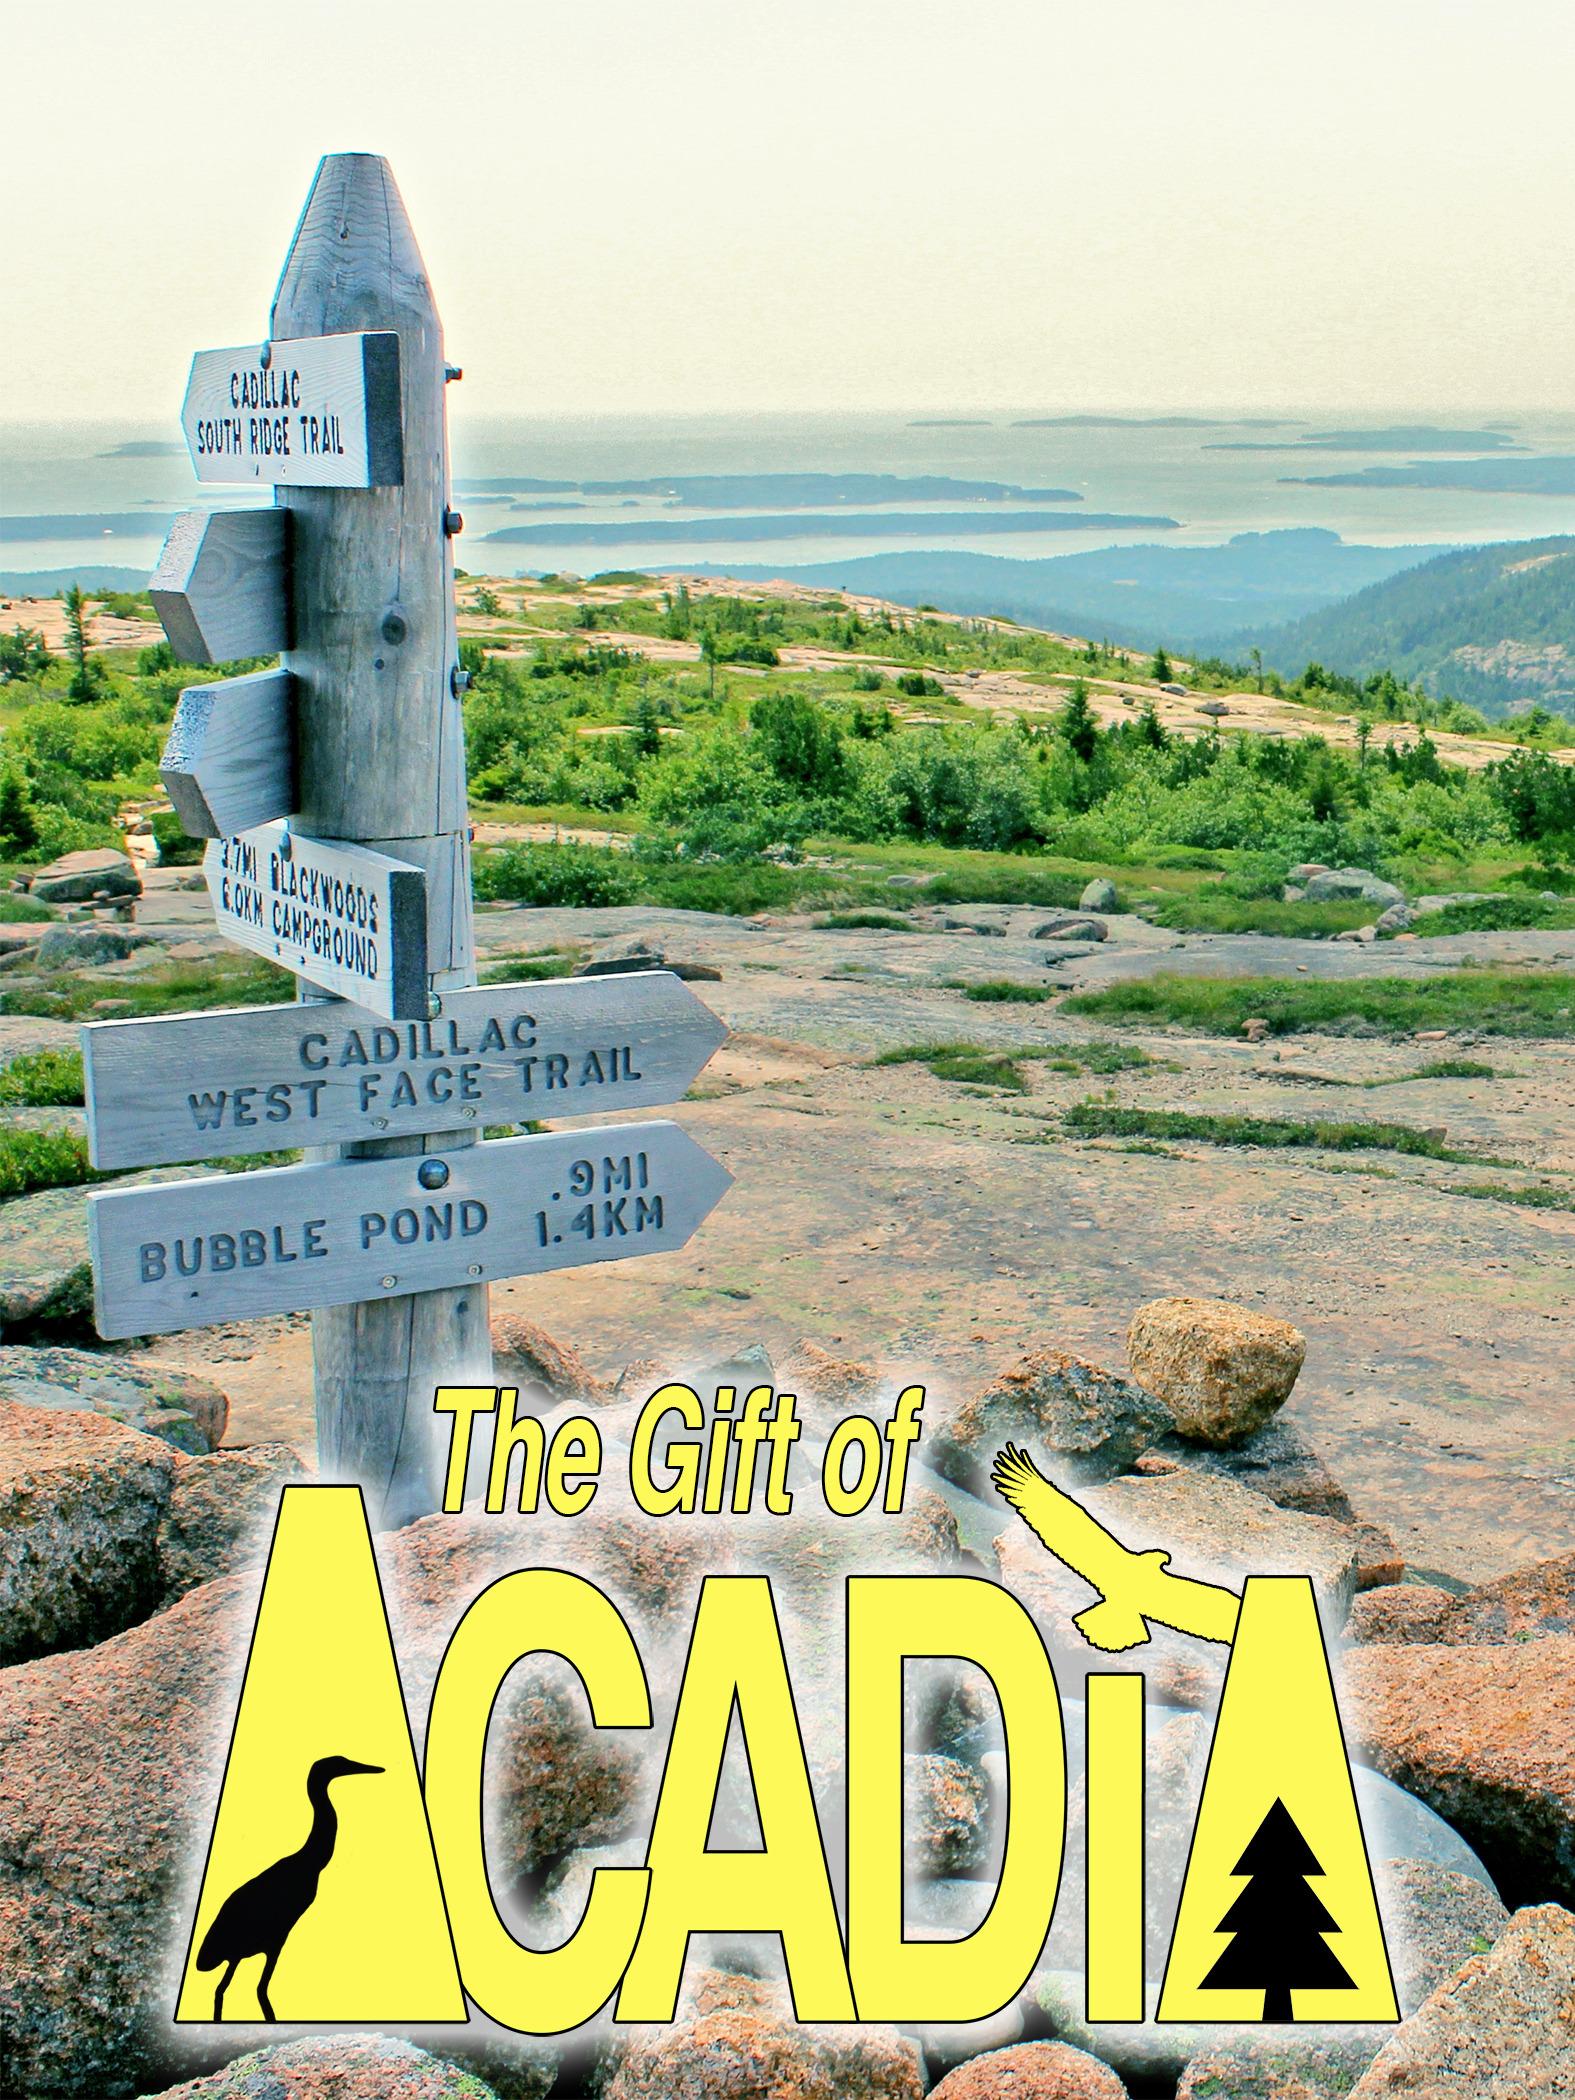 The Gift of Acadia [OV]